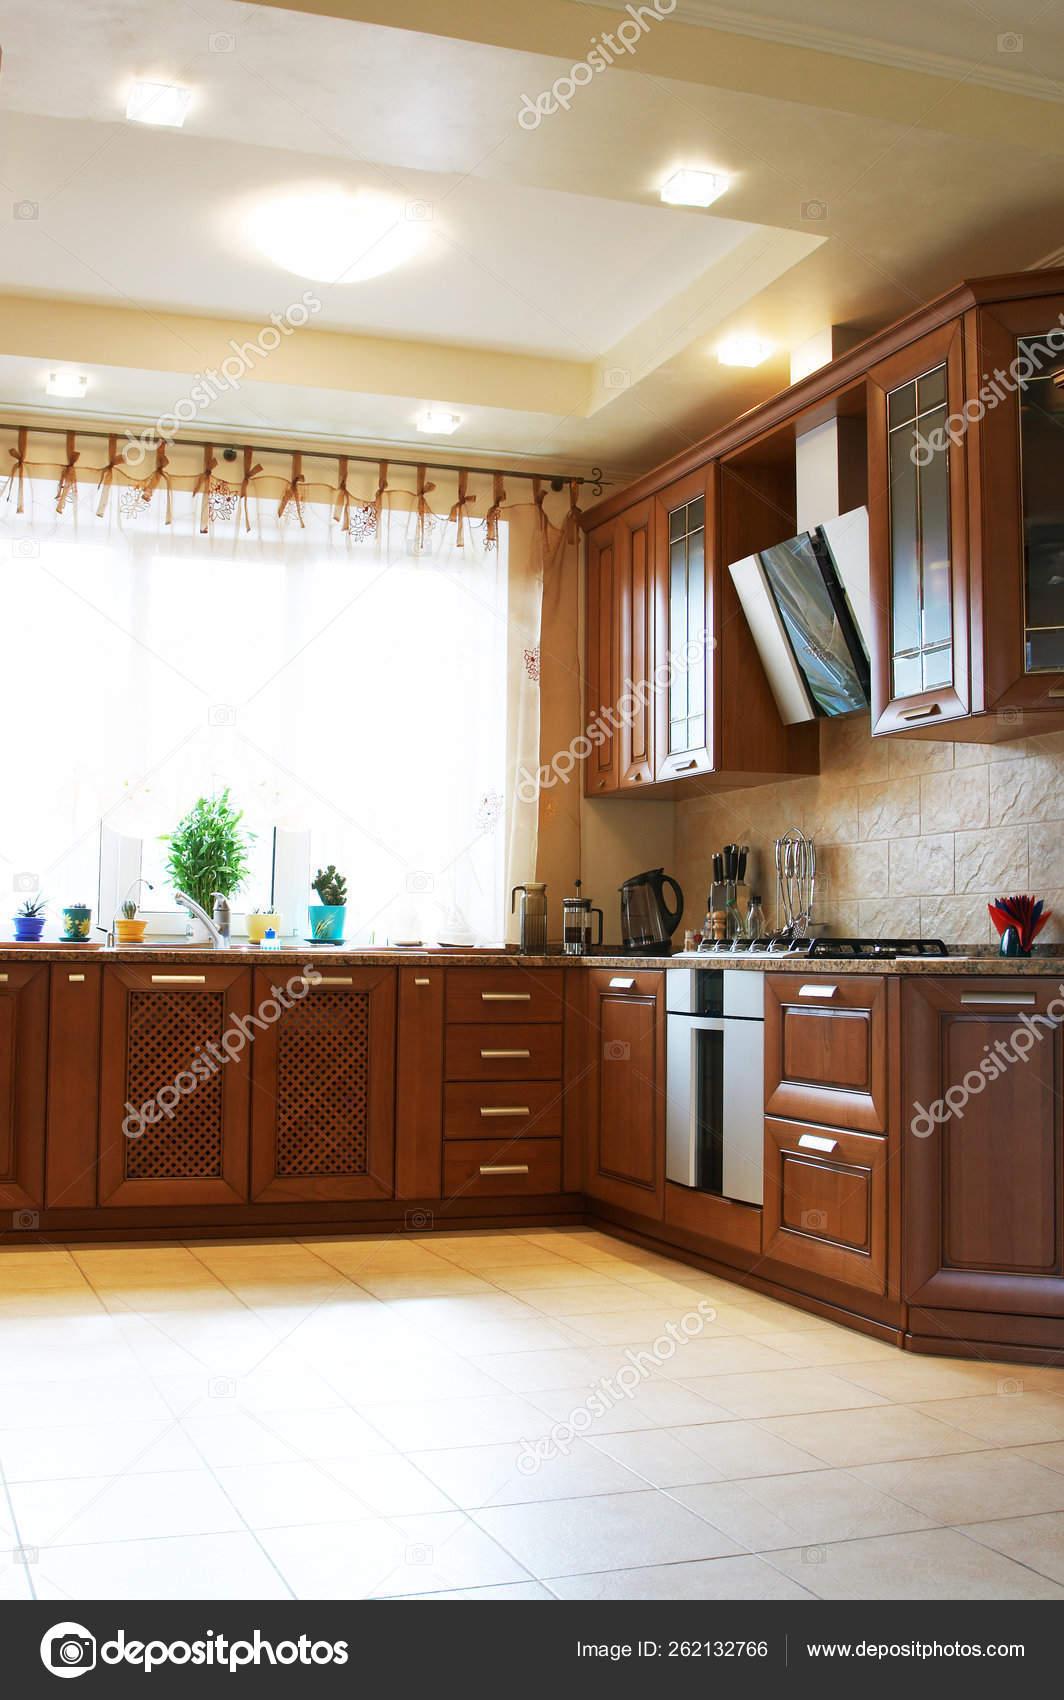 Muebles Cocina Madera Casa Moderna — Foto de stock ...